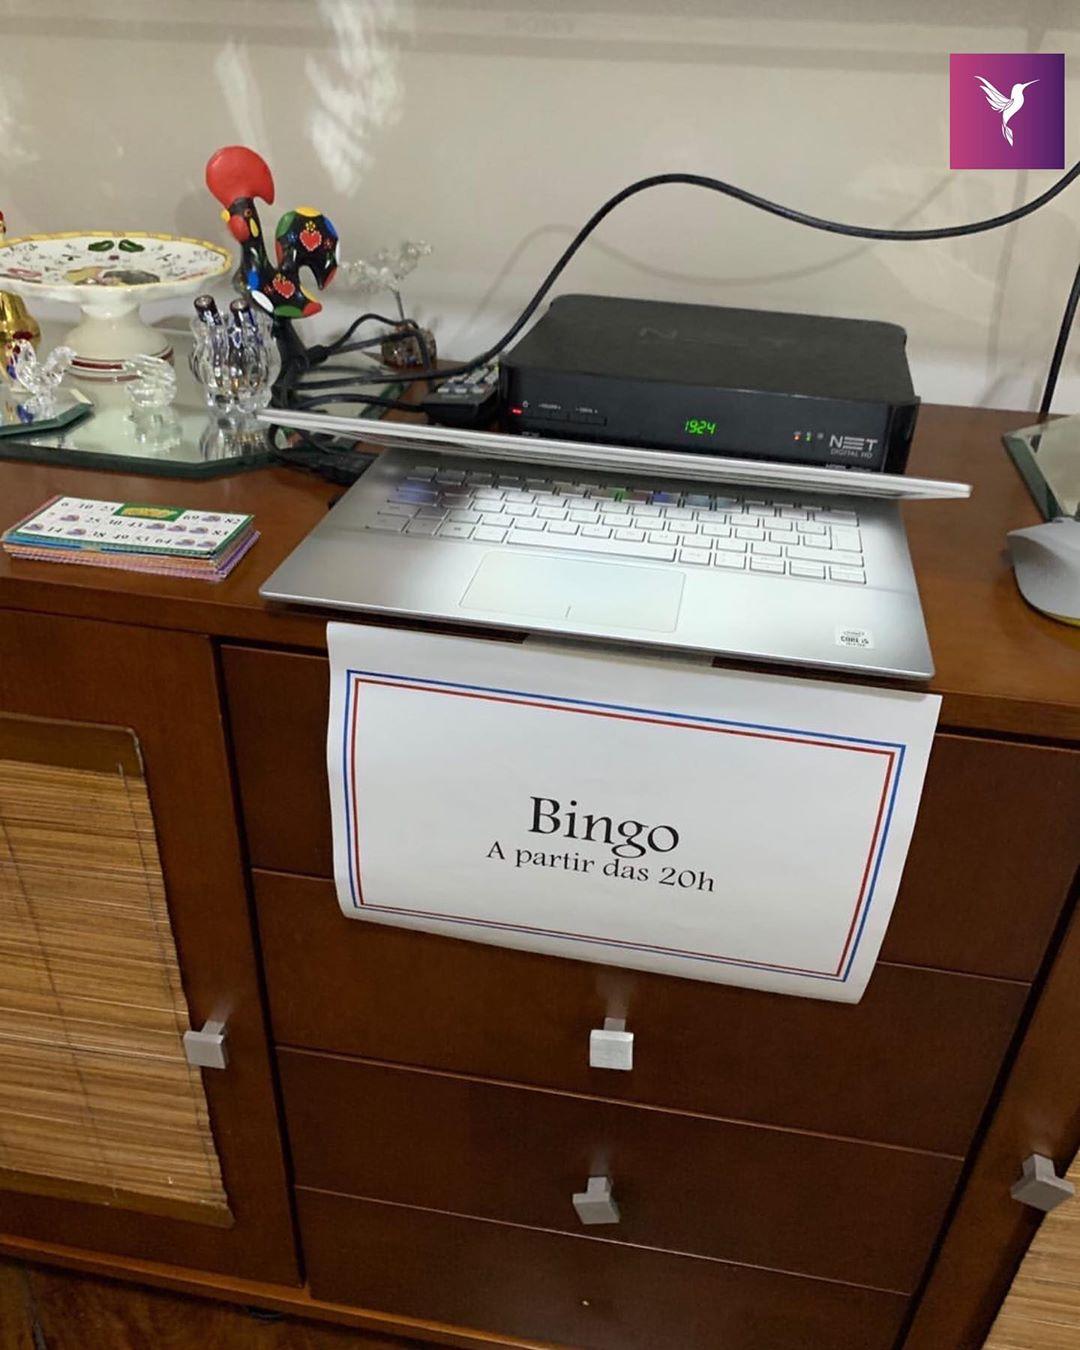 plaquinha bingo festa junina perto notebook